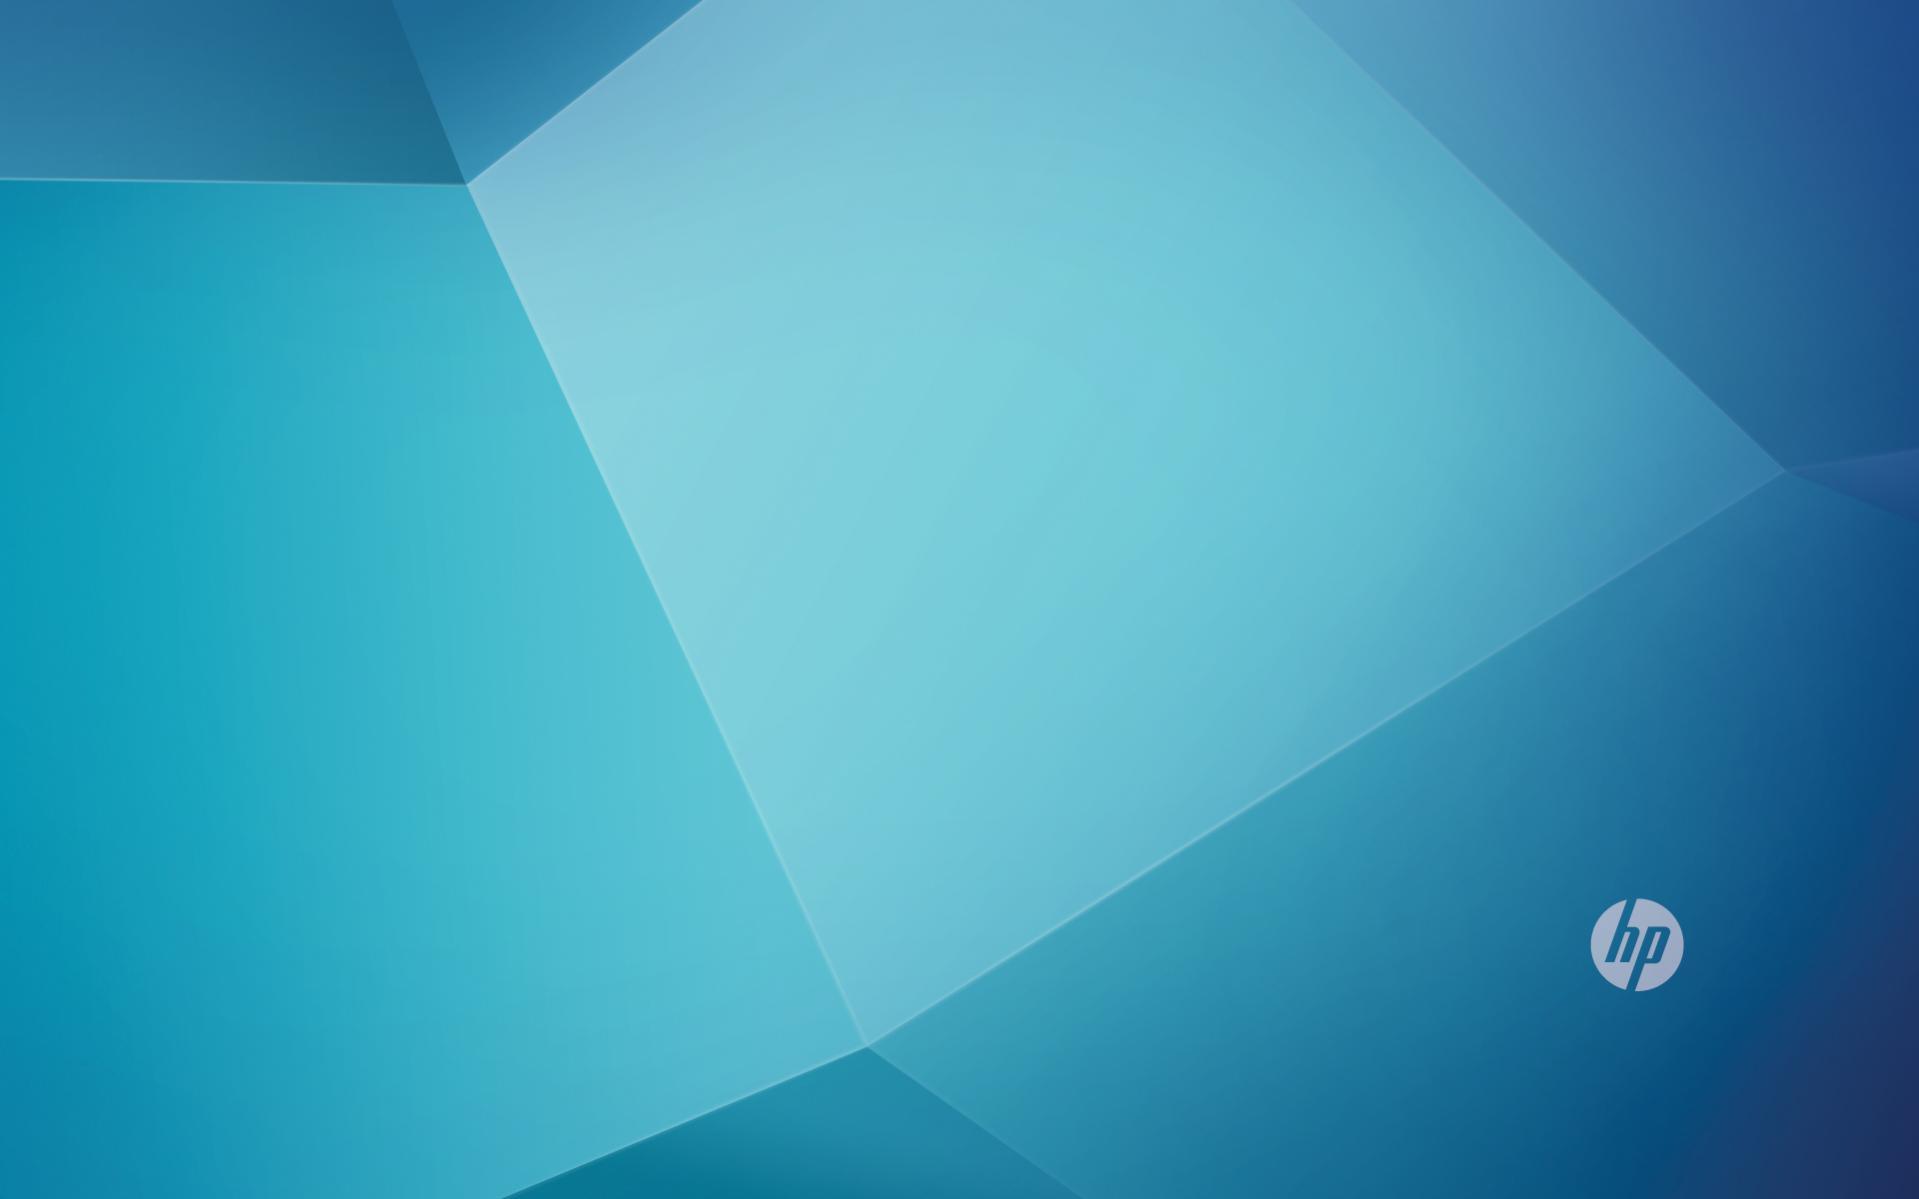 Solved Original Wallpaper Hp Support Forum 6521585